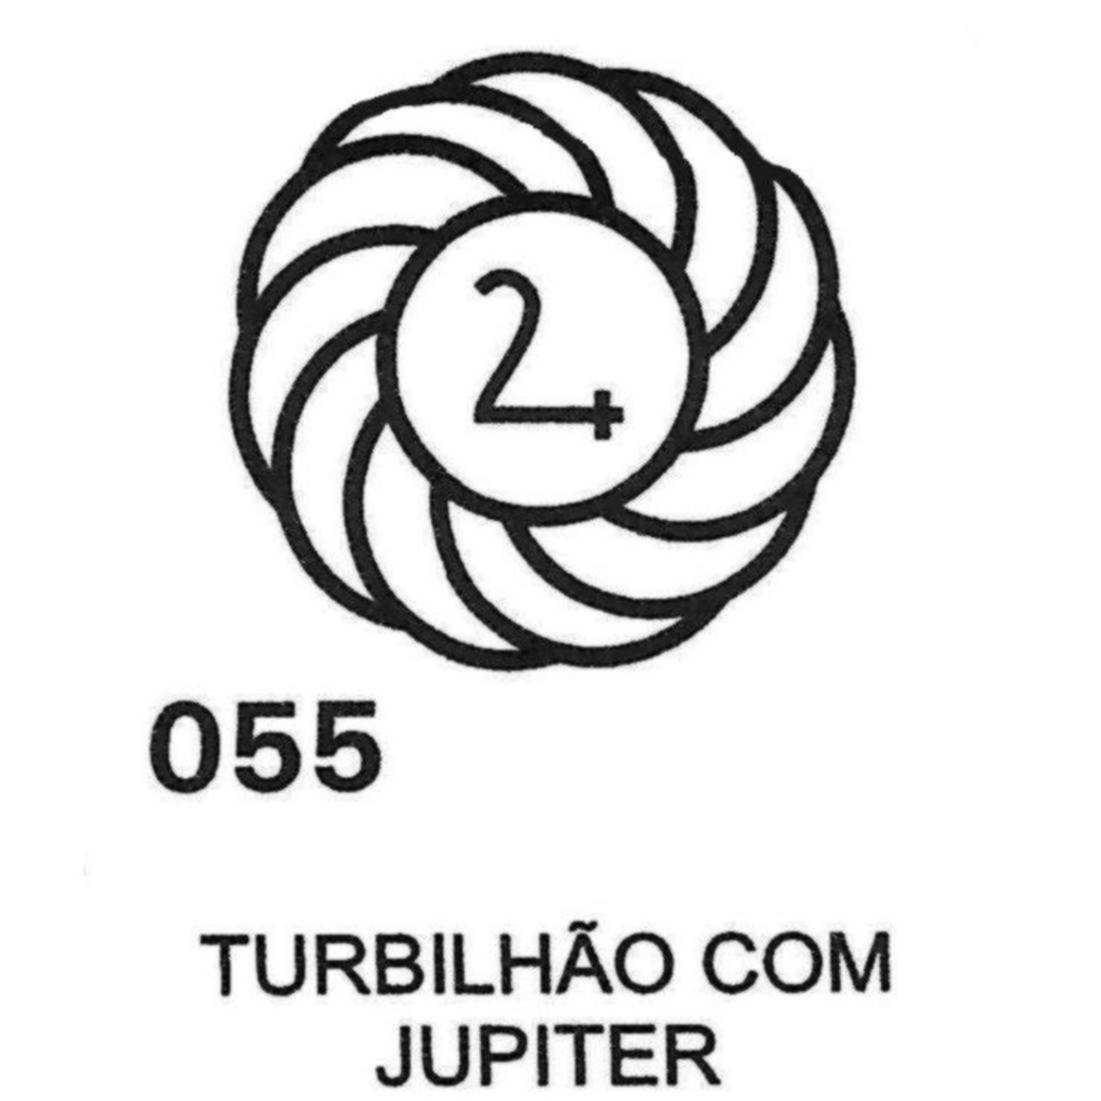 Turbilhão com Júpiter - PVC  -  Zots